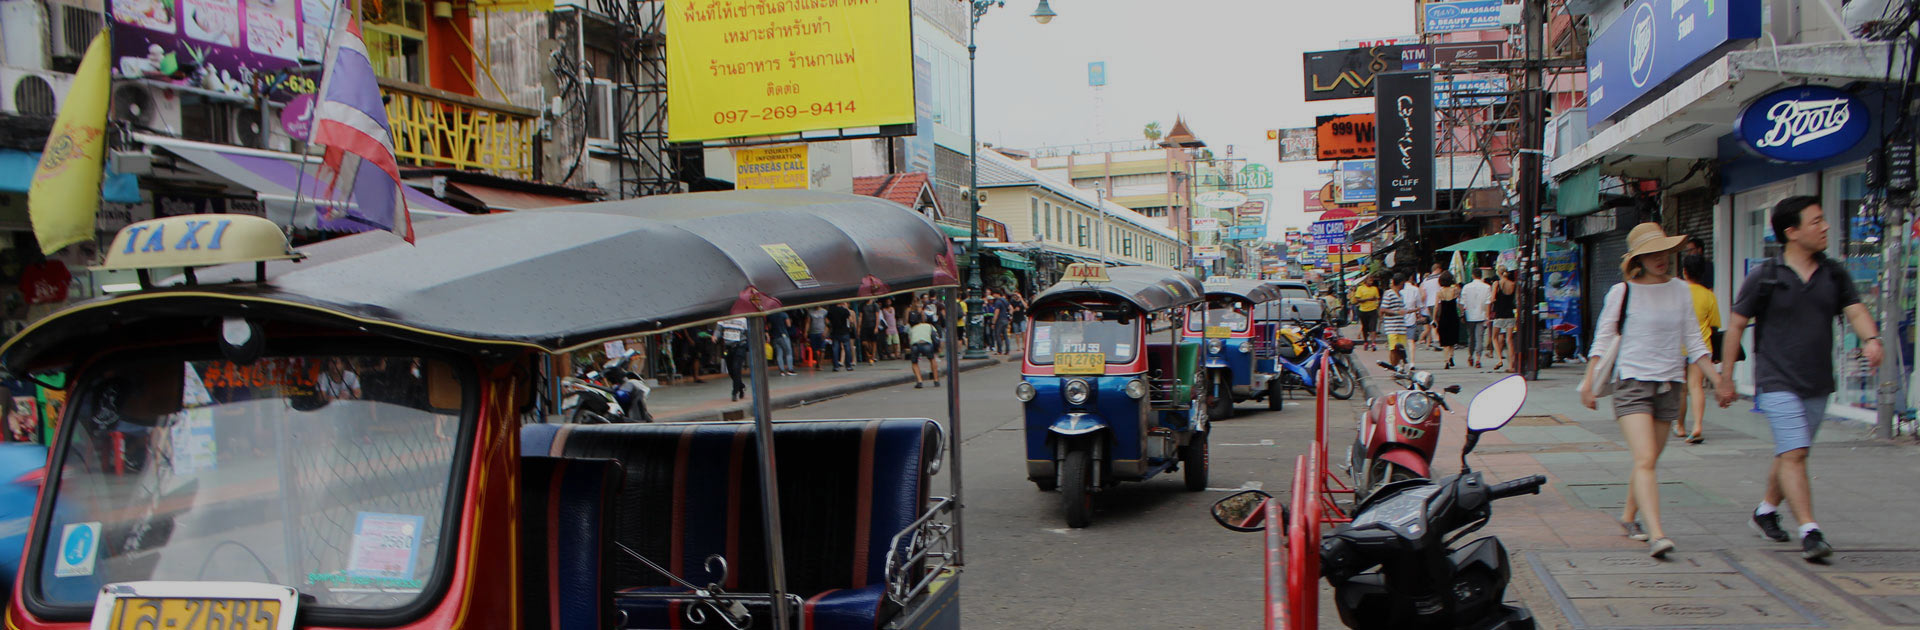 TH Bangkok y Koh Yao 10 días 5